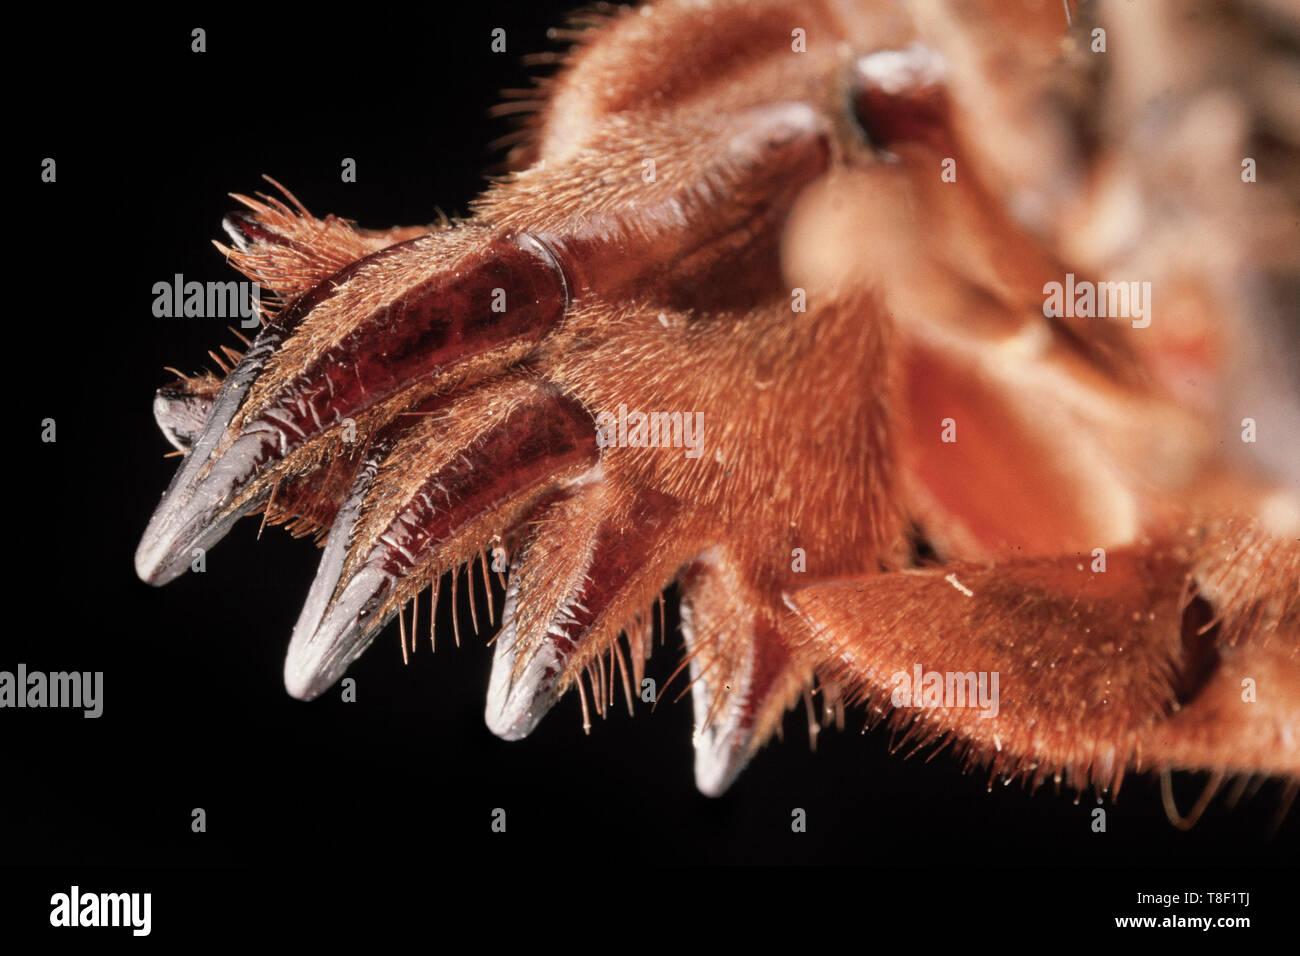 Vordere halteklaue der maulwurfsgrille Gryllotalpa brachyptera, Stockbild